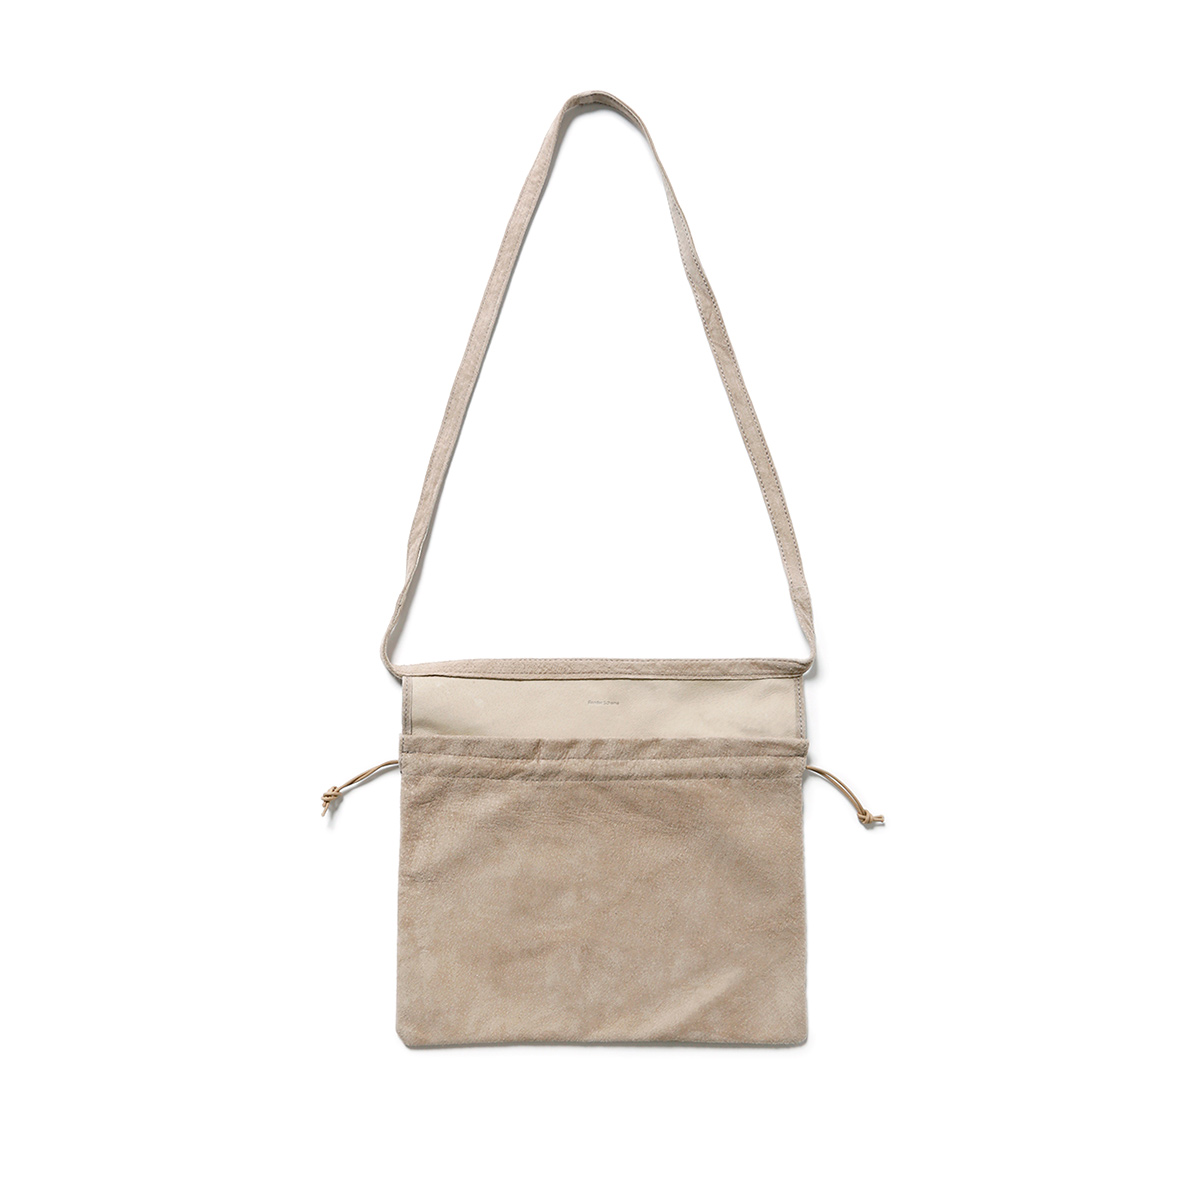 Hender Scheme / red cross bag small -Beige